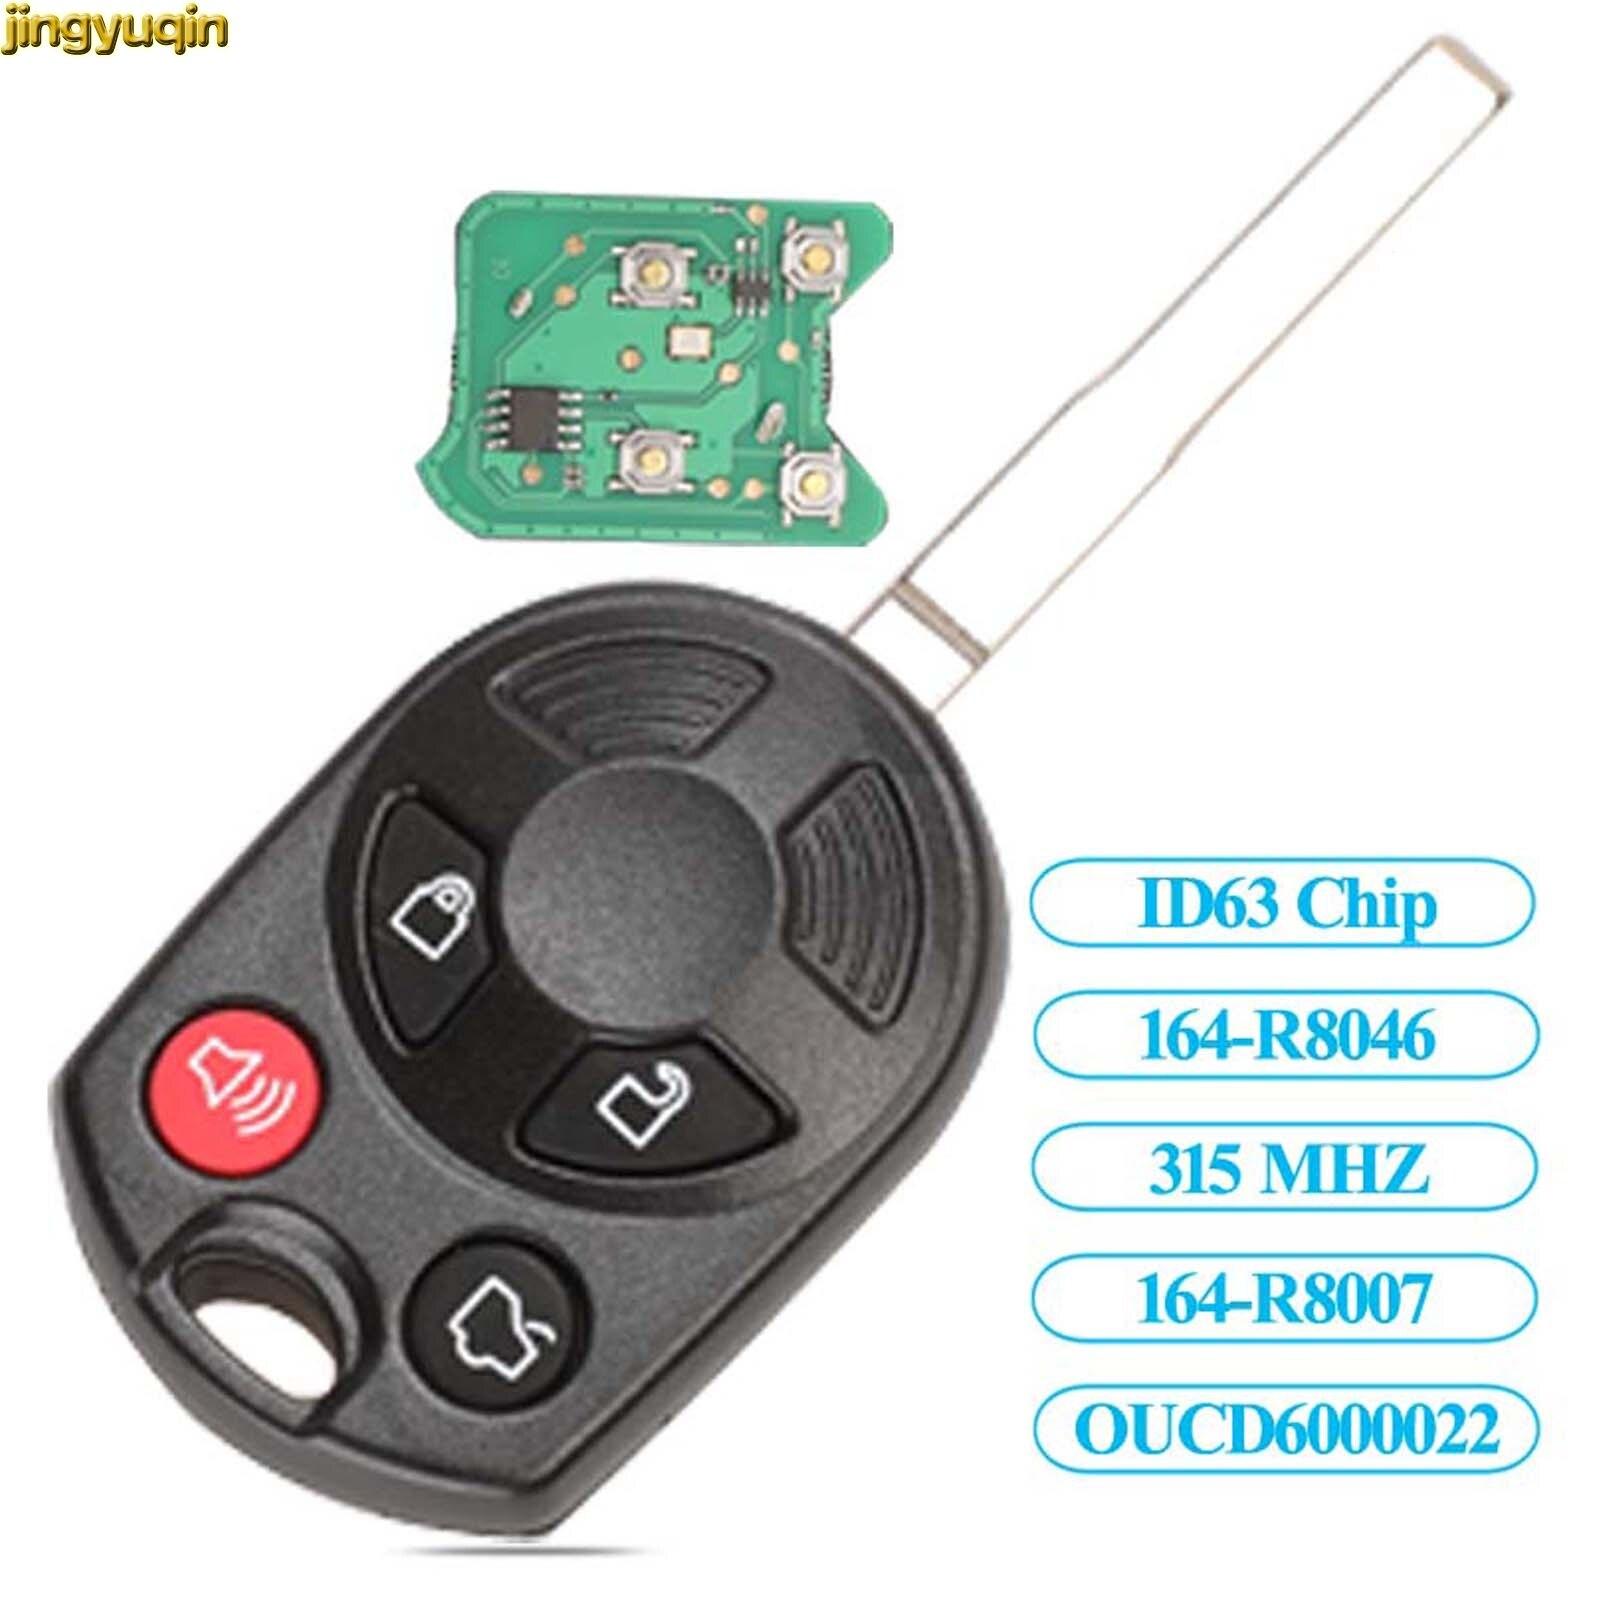 Jingyuqin удаленный автомобиль полный ключ 315 МГц CY22 для Ford Escape Автозапуск комбо OUCD6000022 ID63 чип транспондера 80bit 4BTN